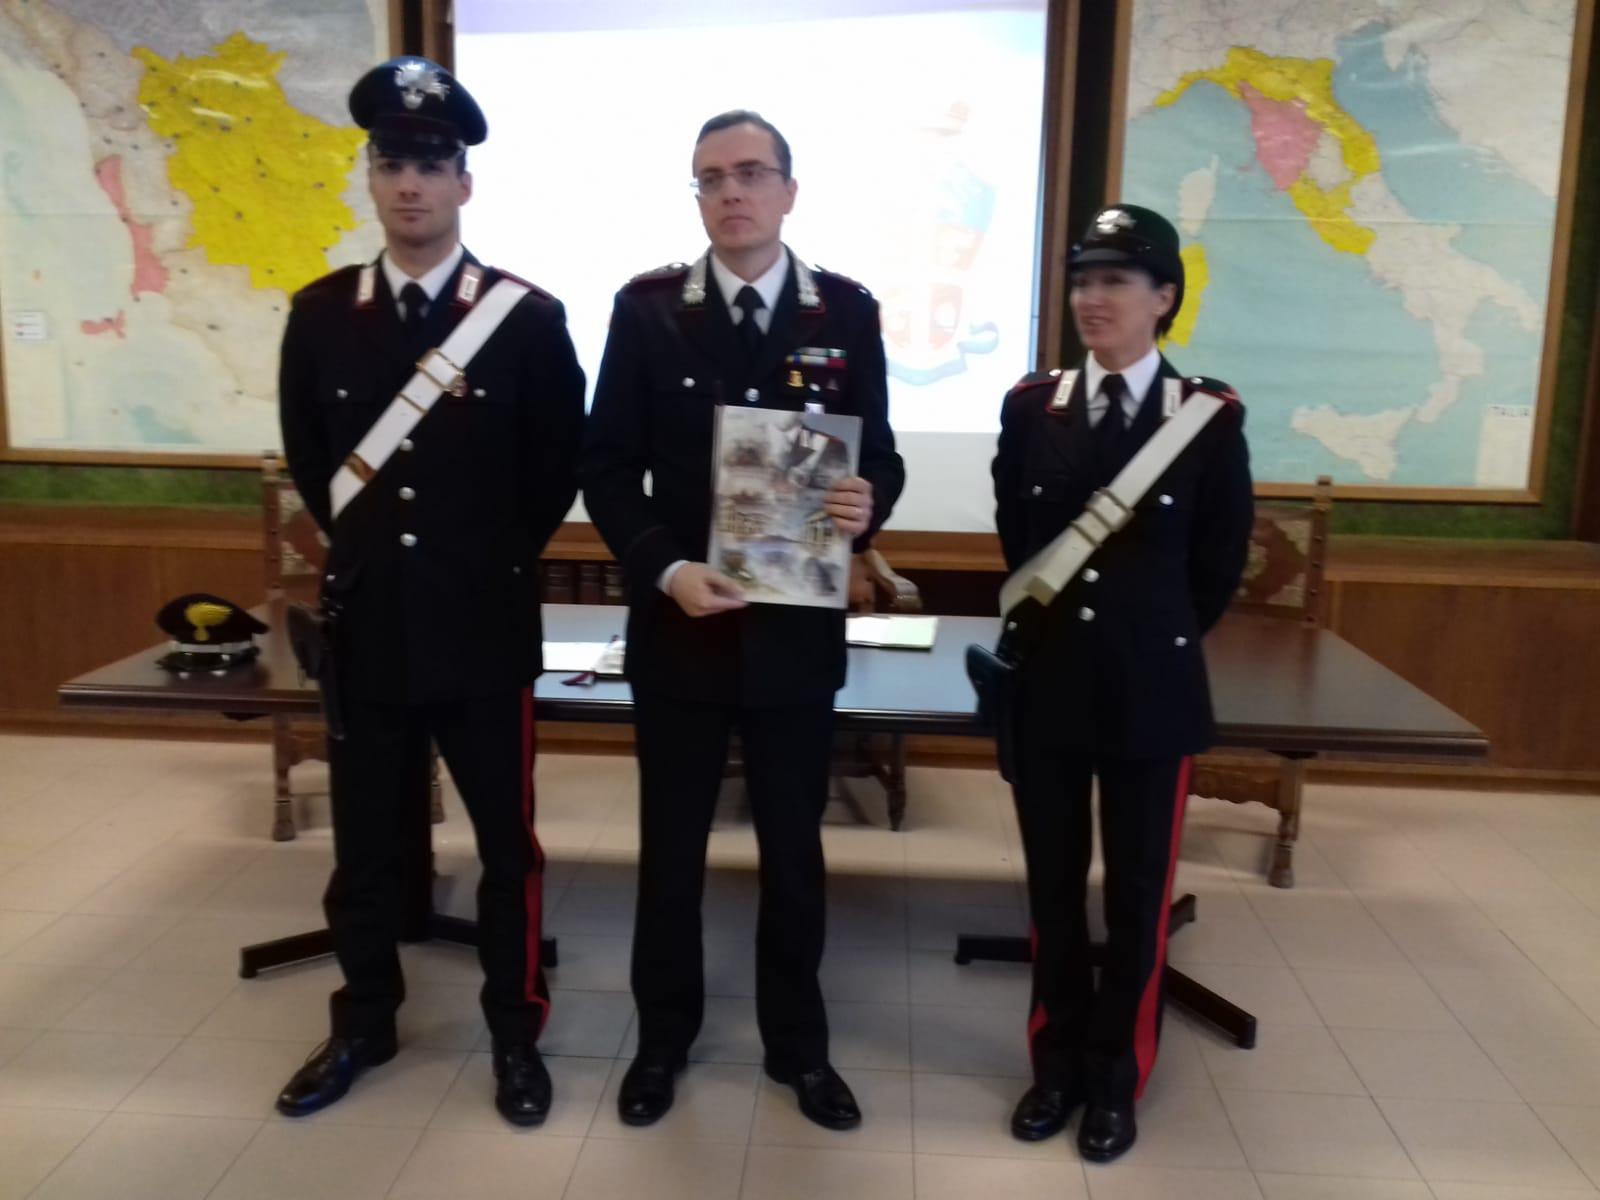 Calendario Carabinieri Dove Si Compra.Ecco Il Calendario Dei Carabinieri 2019 Livornopress